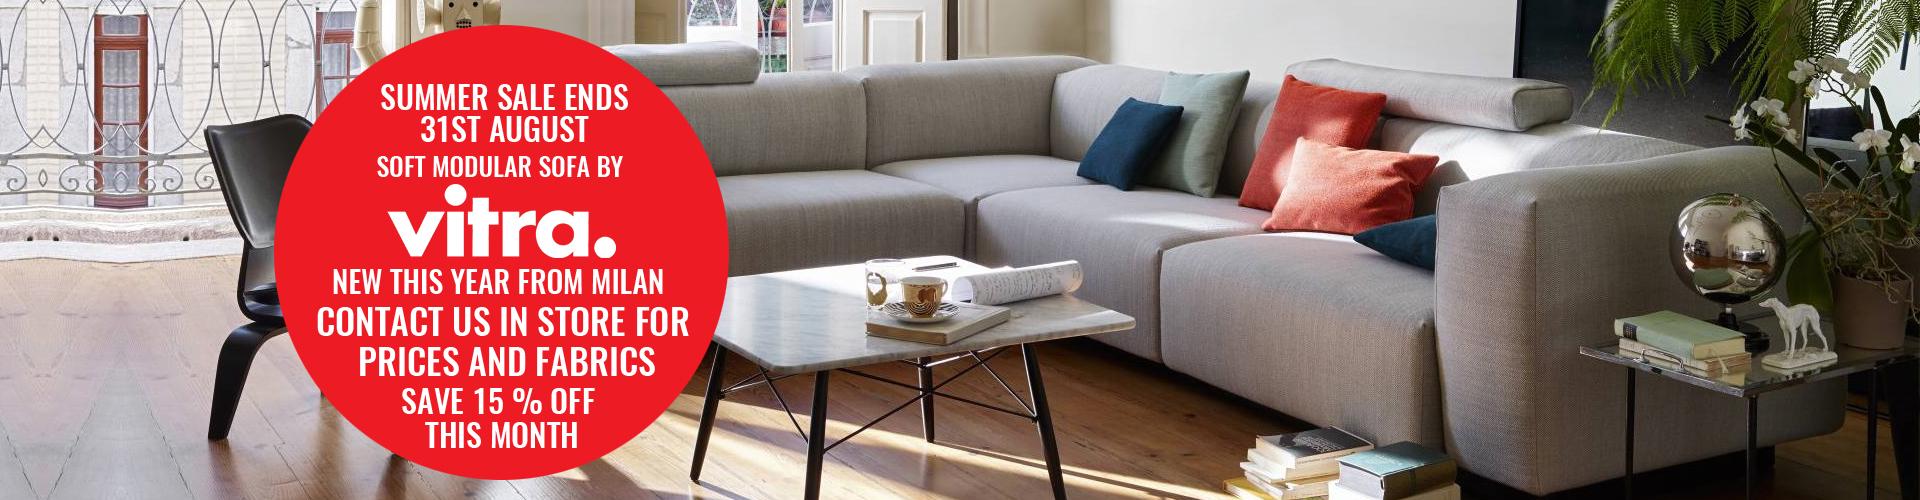 Vitra furniture